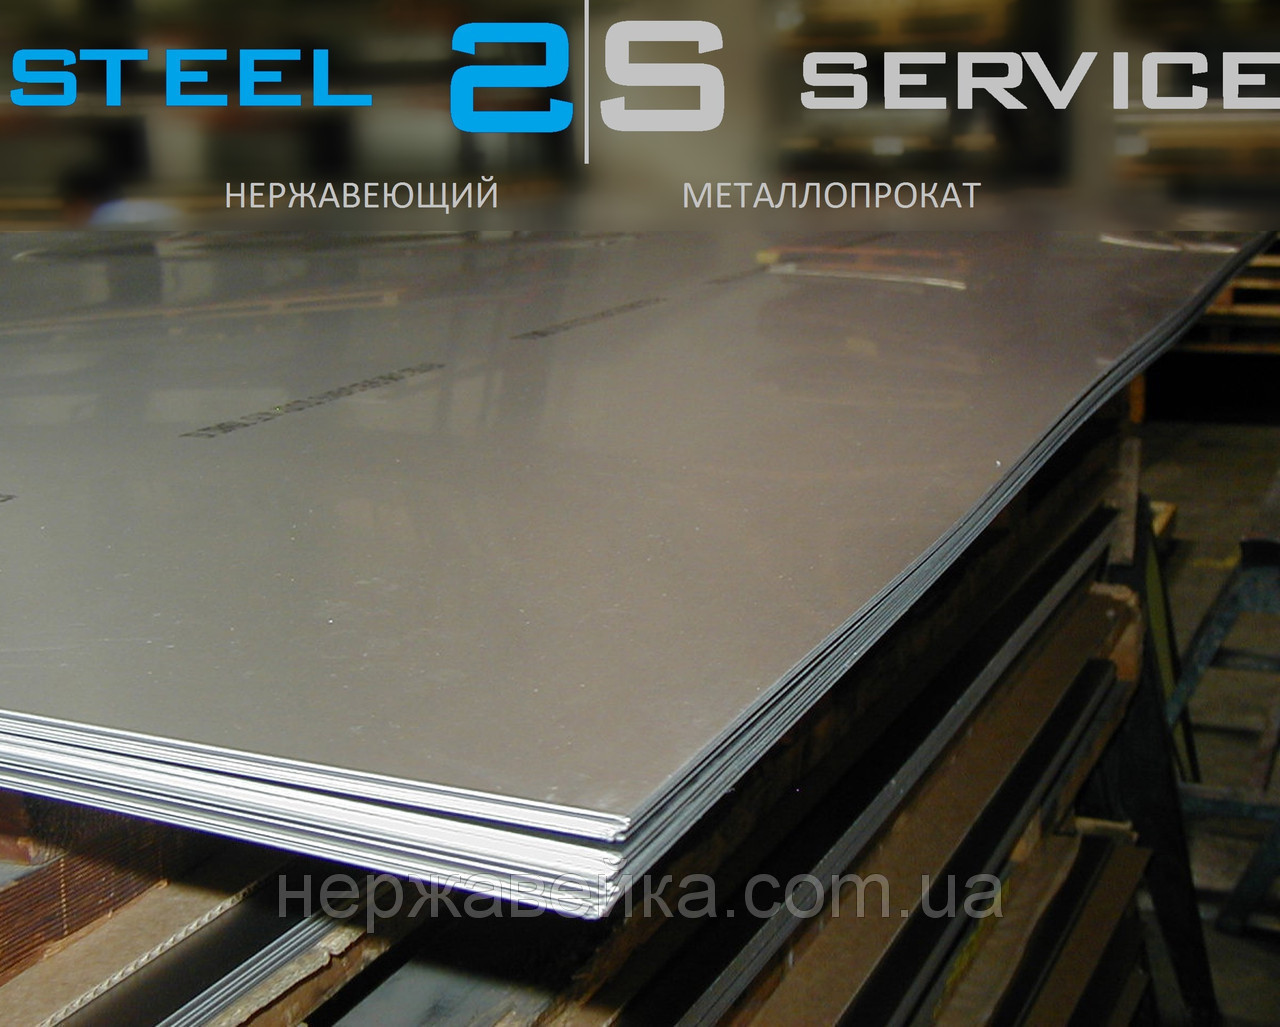 Нержавеющий лист 2х1250х2500мм  AISI 316Ti(10Х17Н13М2Т) BA - зеркало,  кислотостойкий